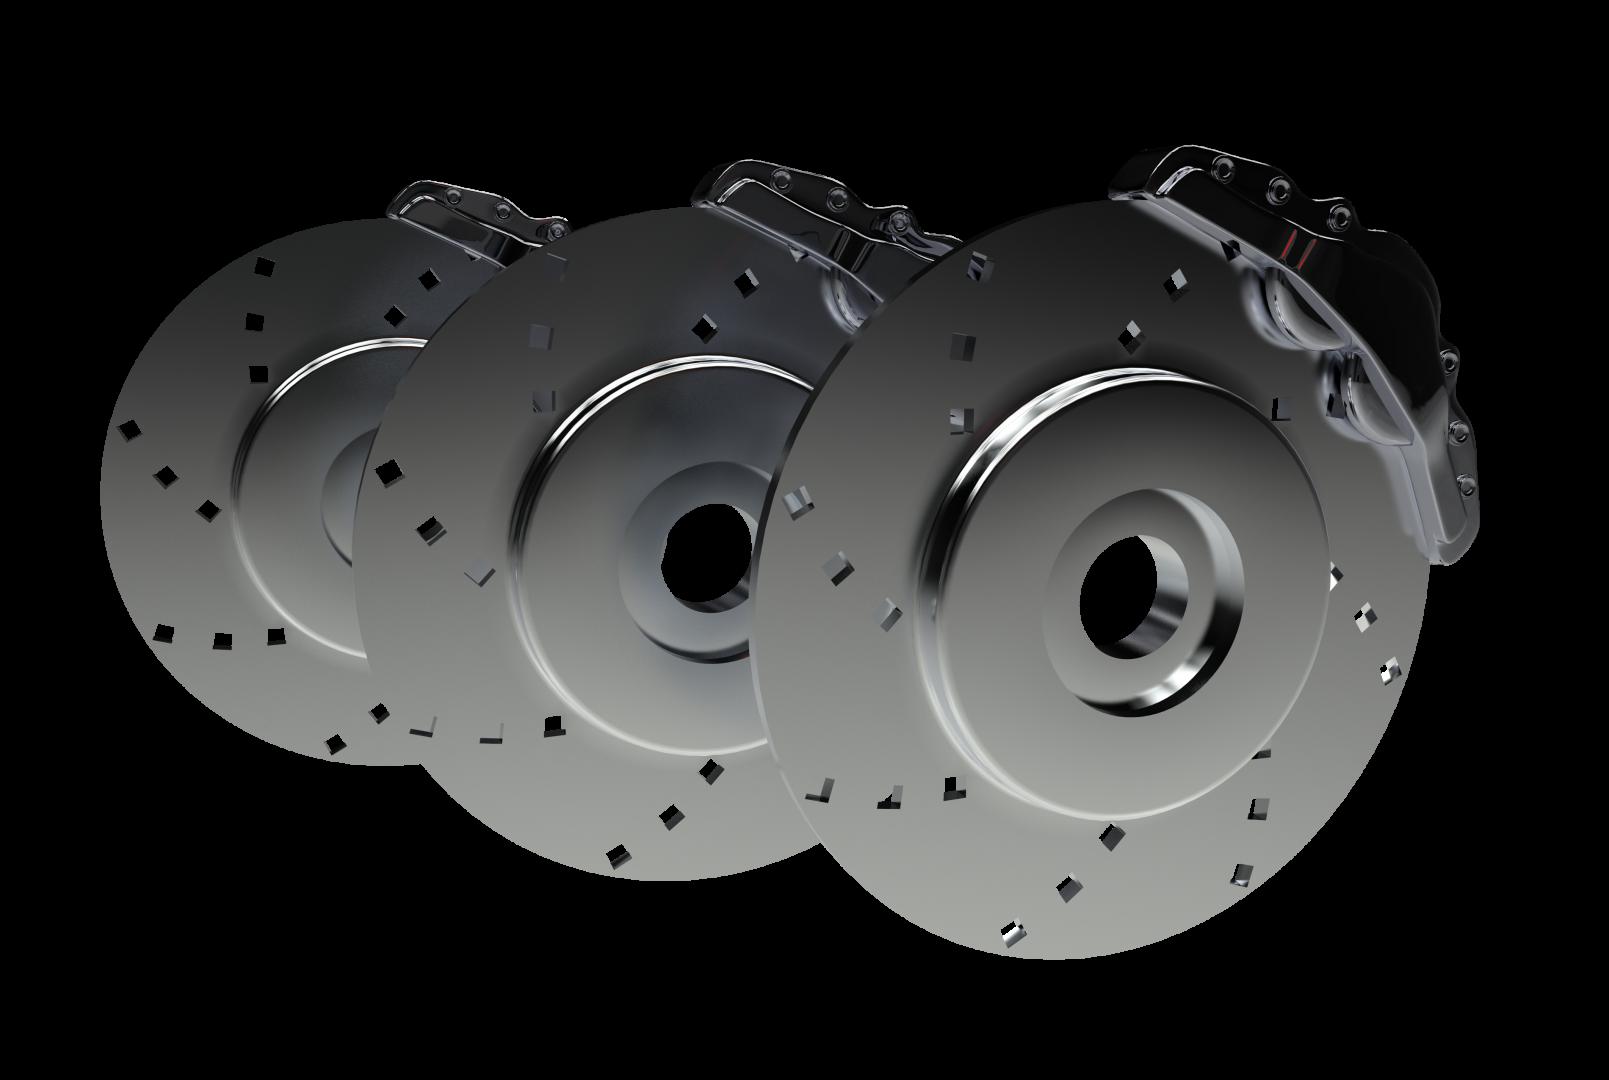 Three disc brakes